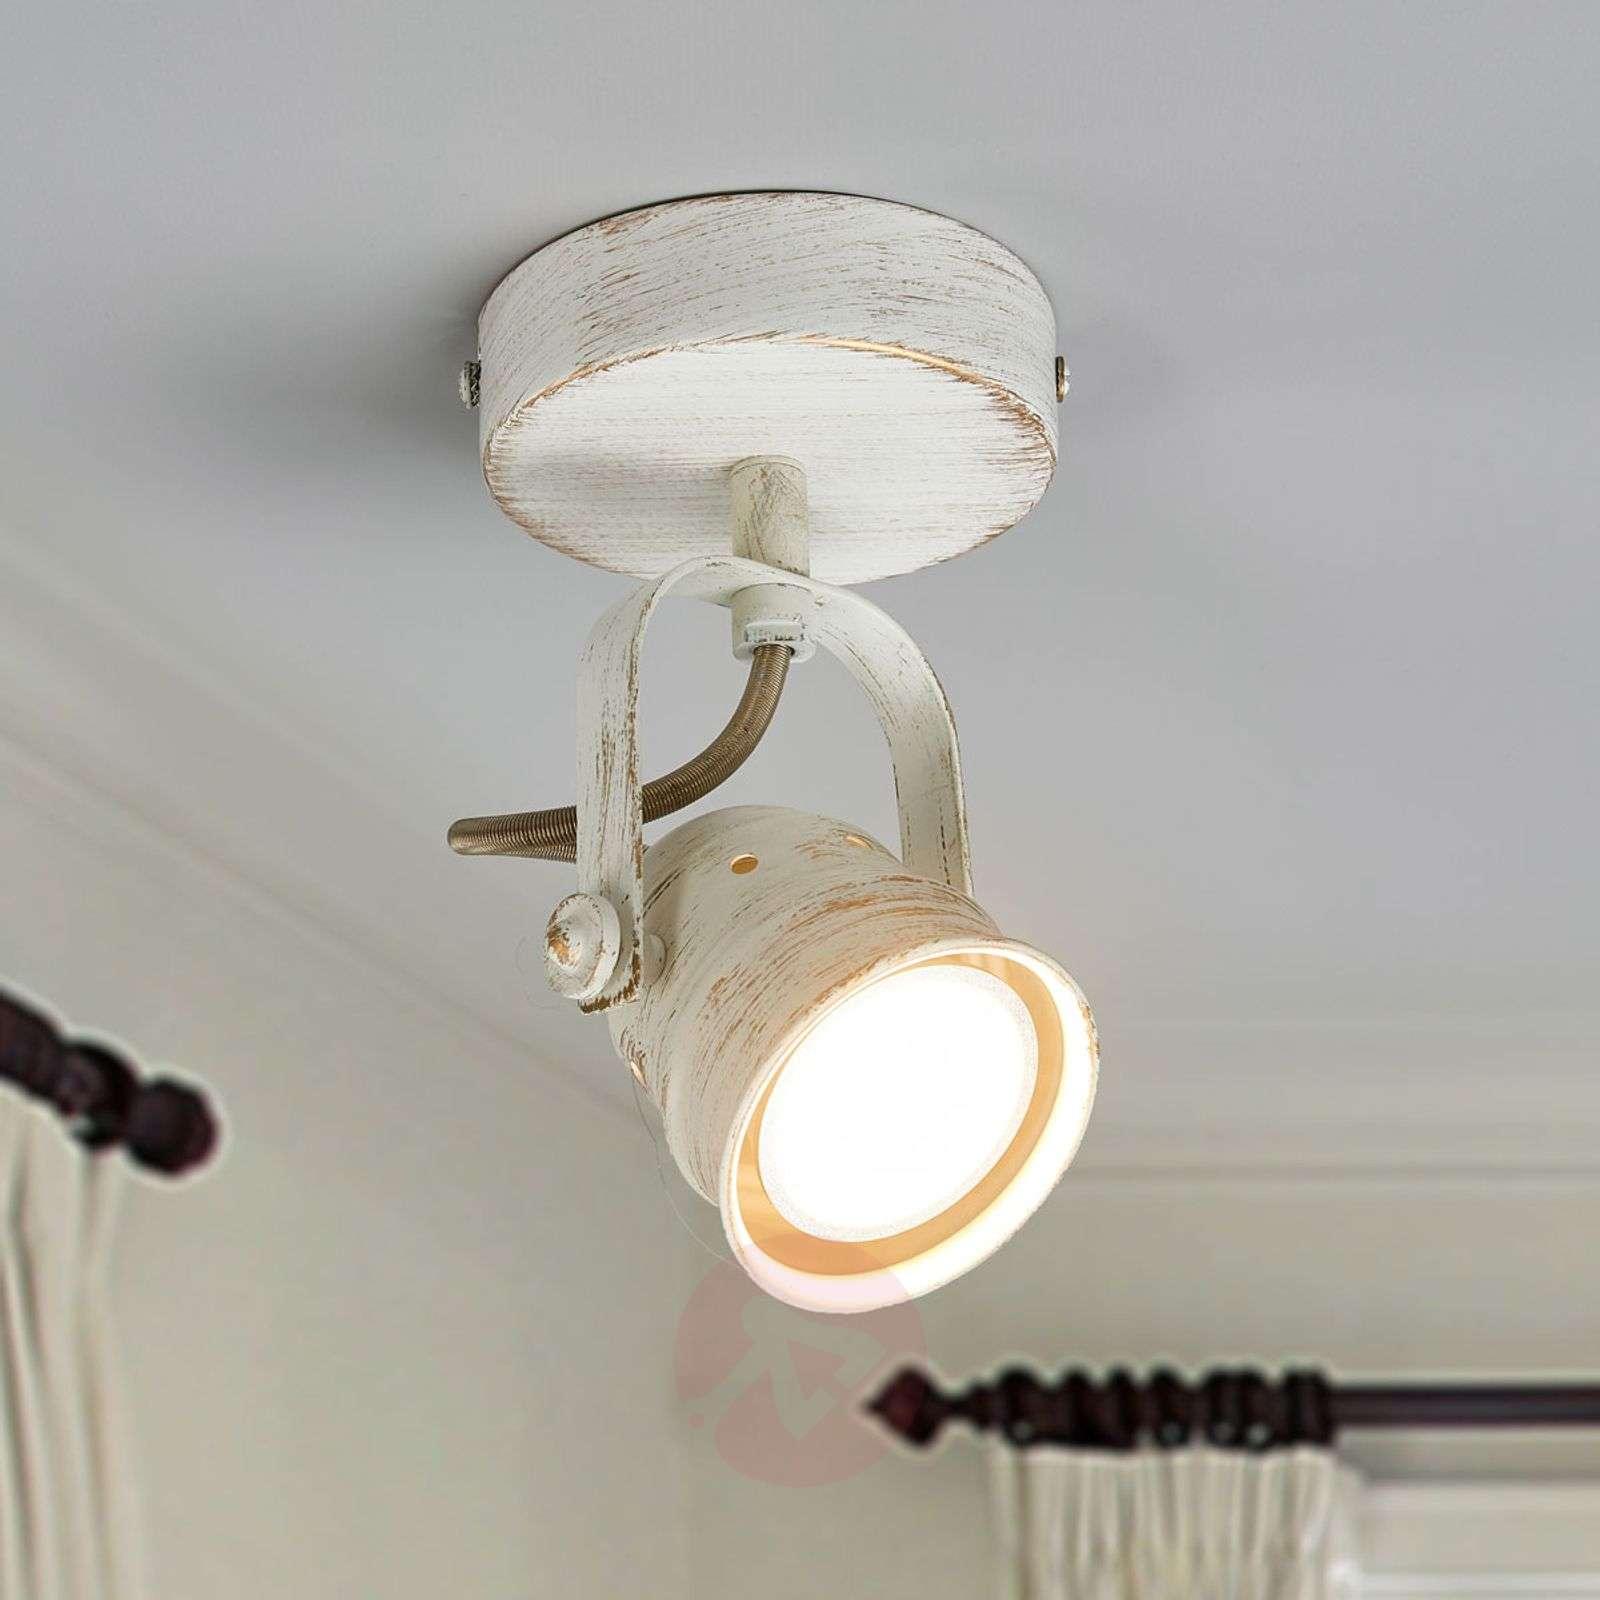 Valkoinen LED-spottivalo Leonor GU10-lampulla